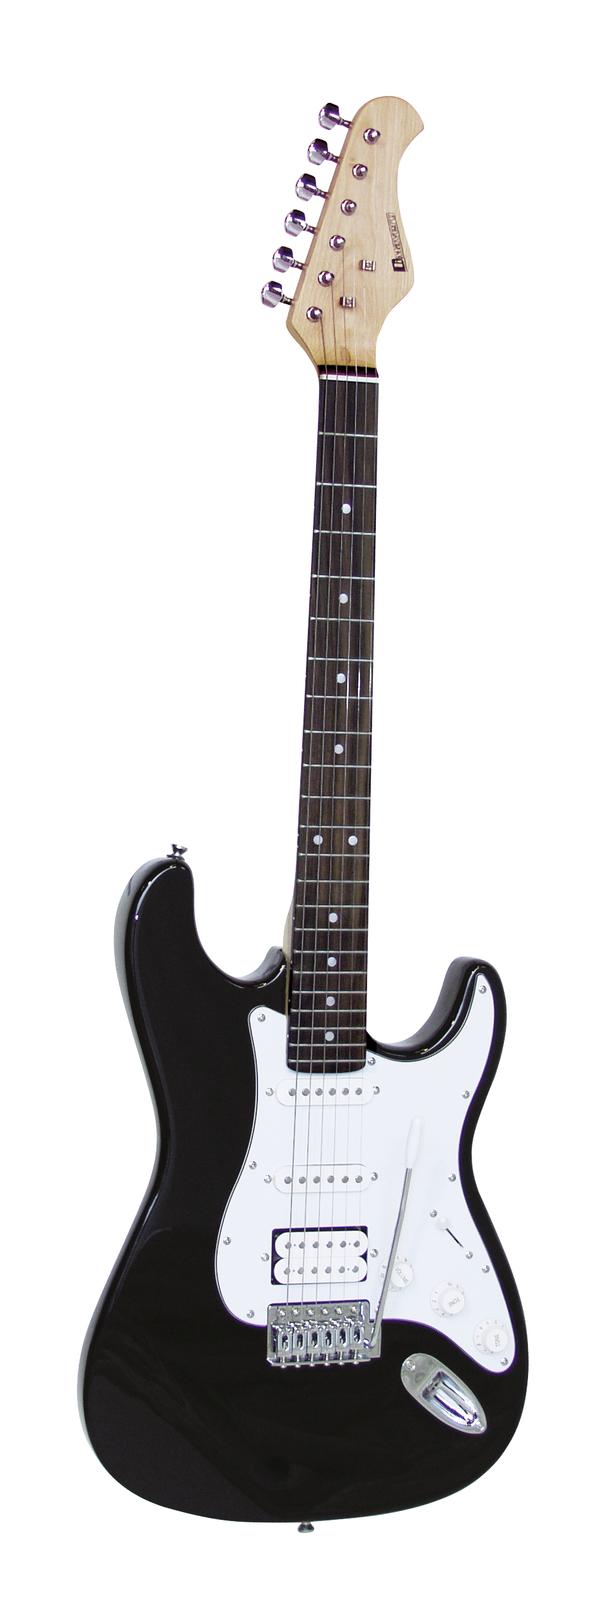 DIMAVERY ST-312 E-Gitarre, schwarz